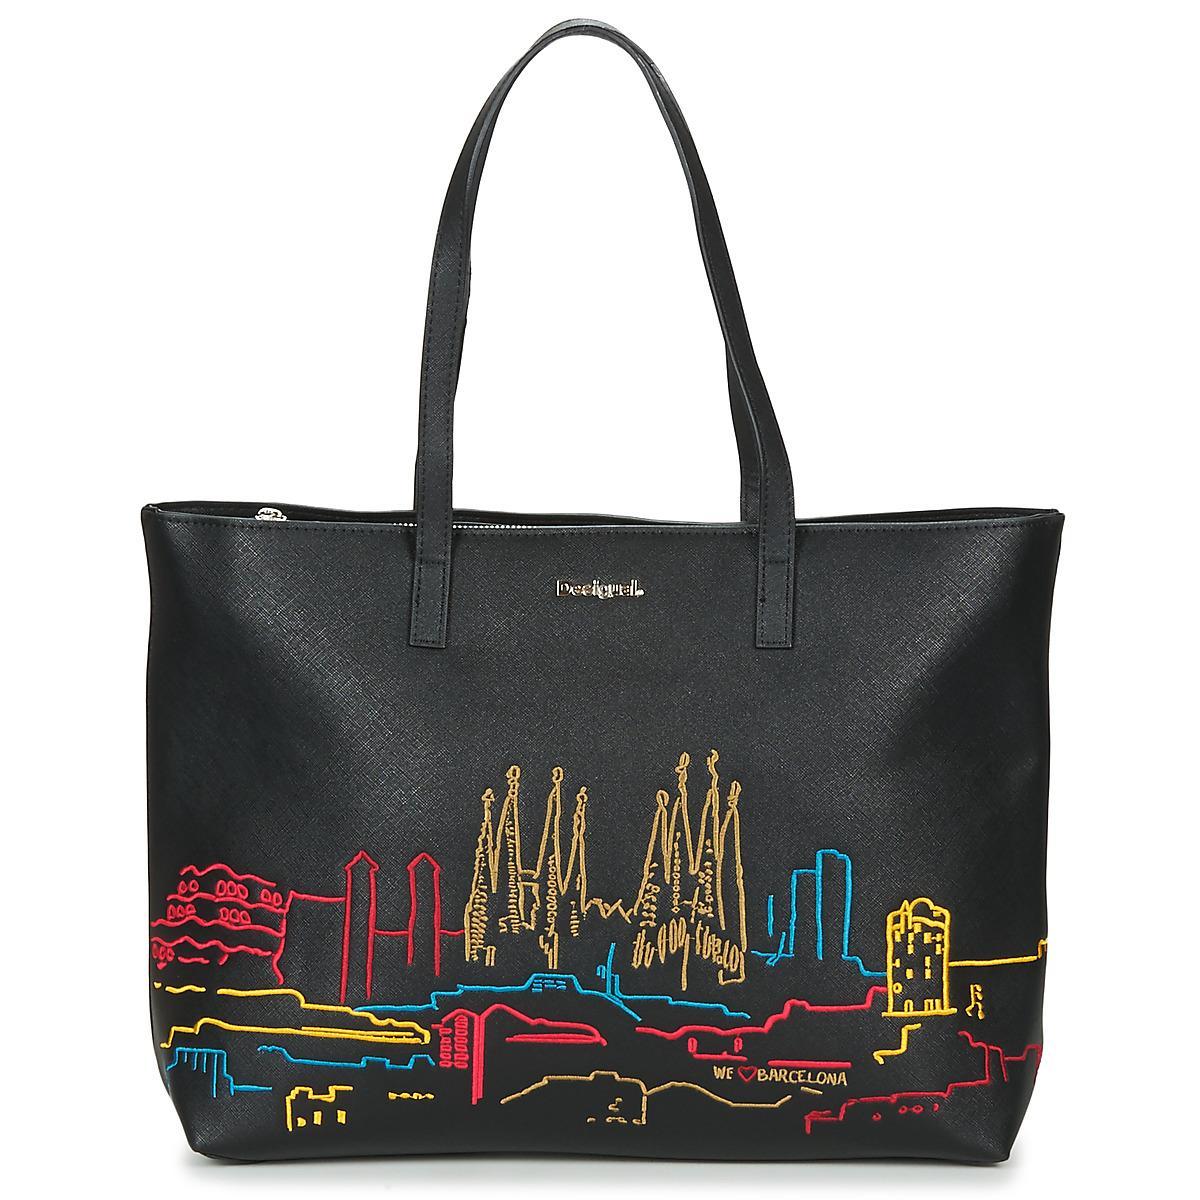 Desigual New Bolimania City Redmond Women s Handbags In Black in ... 83db2f2079c26